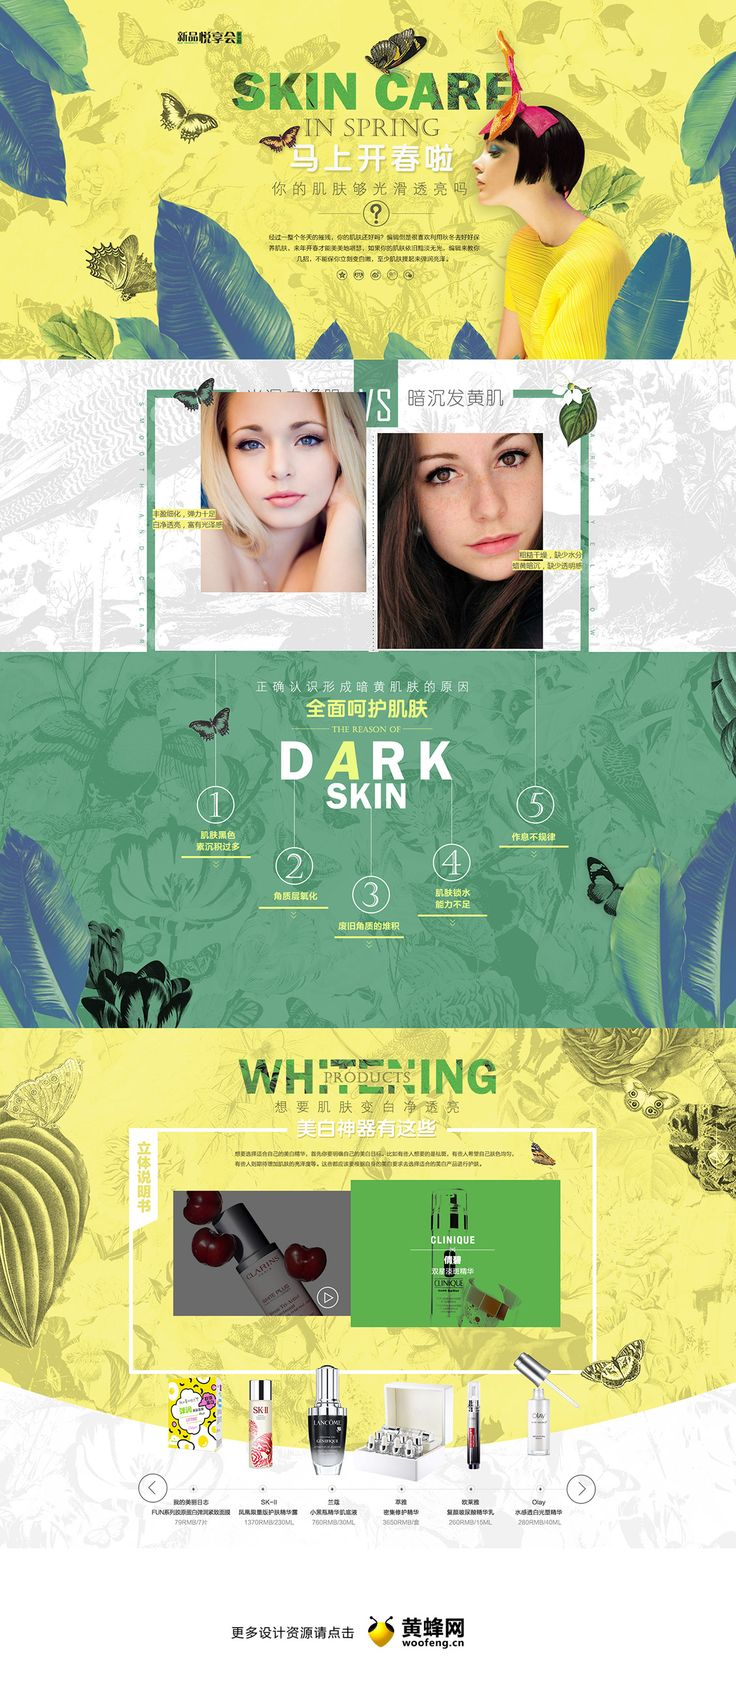 #web #design http://www.yoka.com/beauty/whiteningskin201602/index.shtml 马上开春啦 你的肌肤够光滑透亮吗?化妆品专题,来源自黄蜂网http://woofeng.cn/